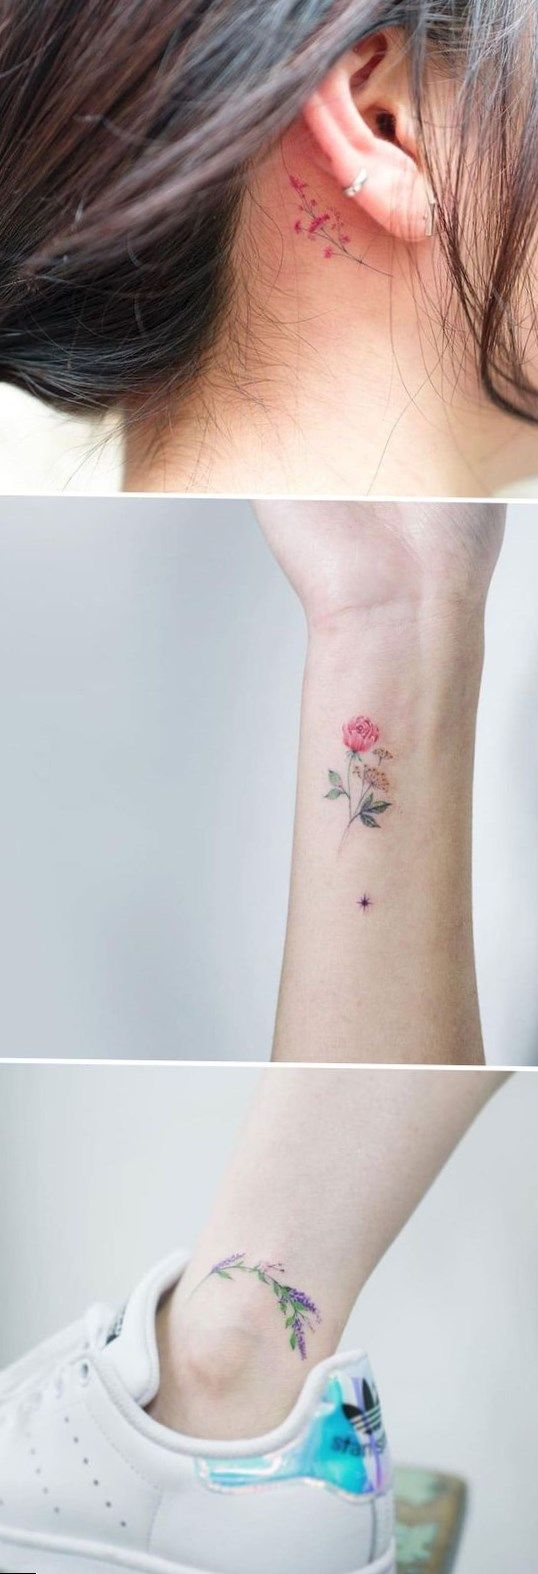 45 amazing japanese tattoo designs tattoo easily -  Designtattoo Tattoo Religious Tattoos For Men Oriental Design Tattoo Small Forearm Tattoo